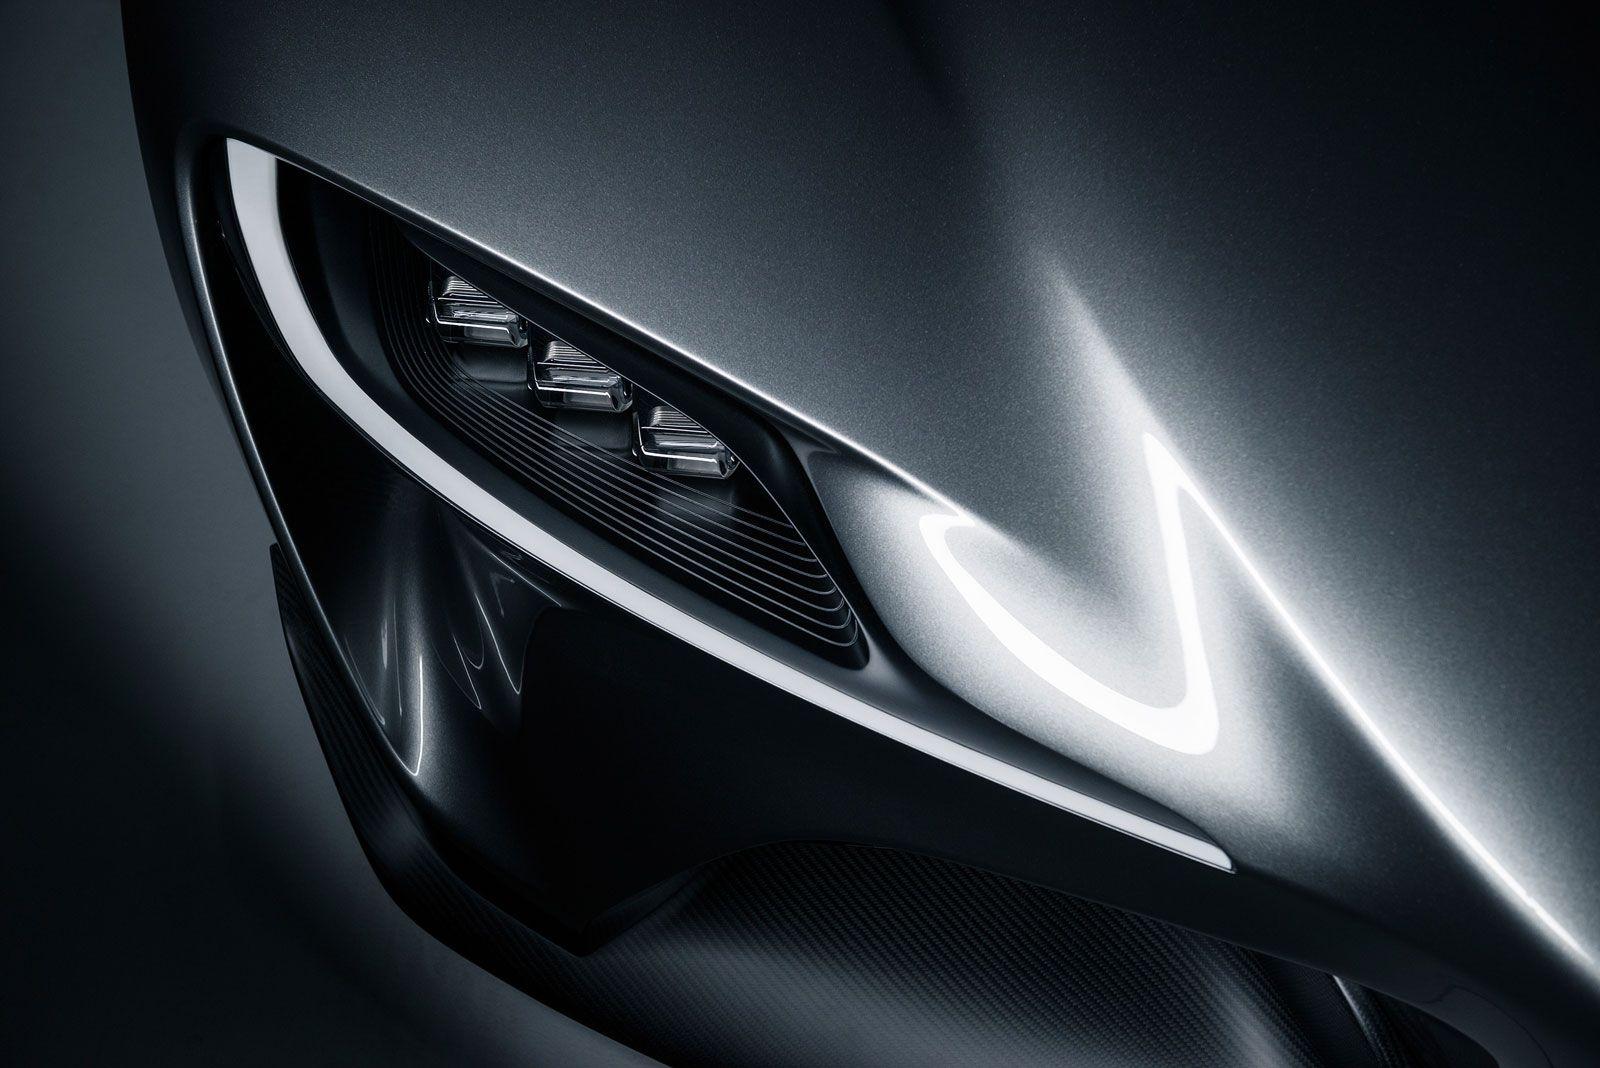 Toyota FT1 Graphite Concept Headlight コンセプトカー, カーデザイン